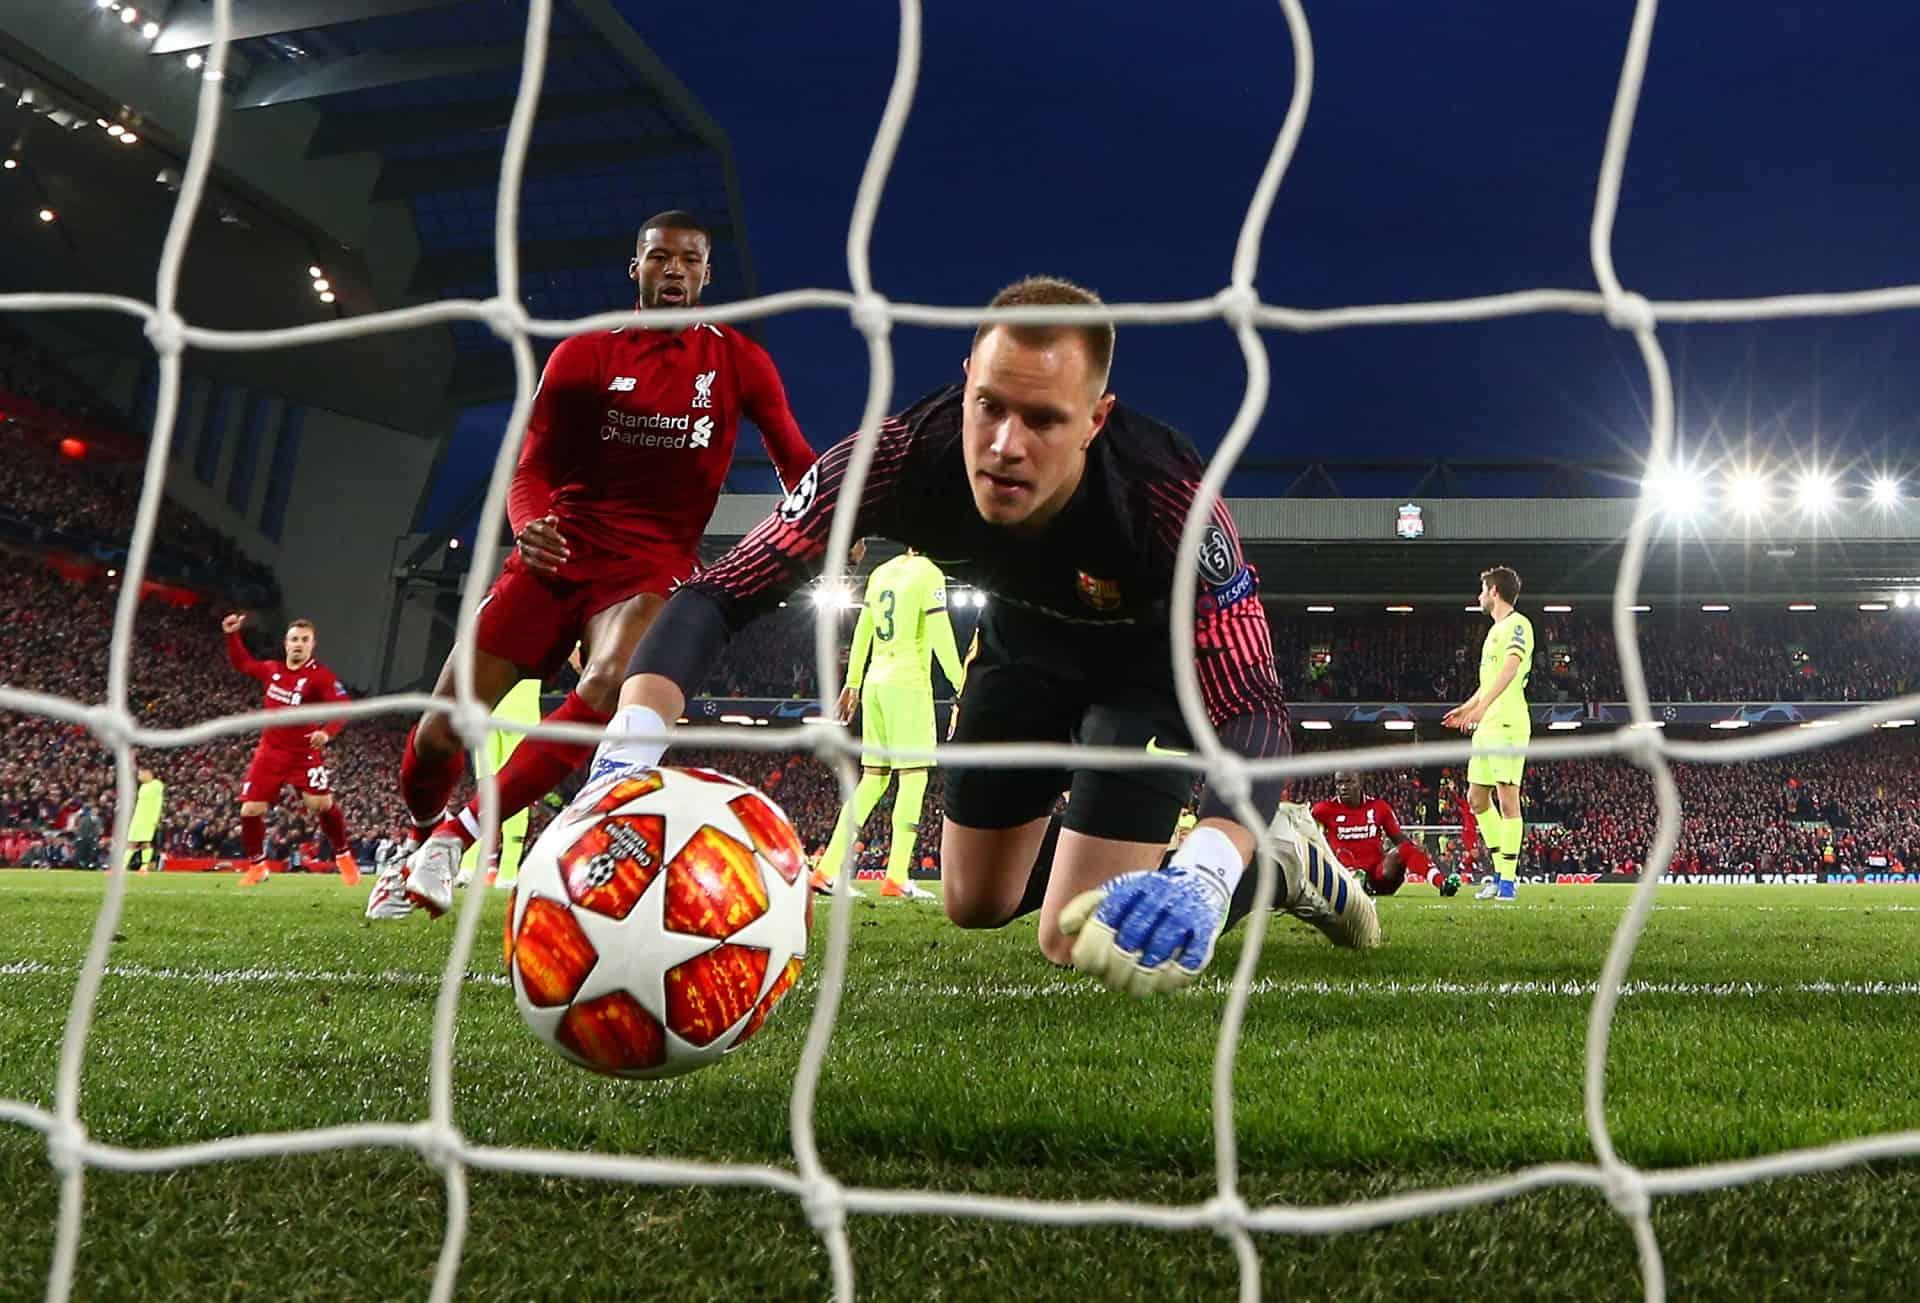 georginio wijnaldum liverpool barcelona anfield goal two champions league 2019